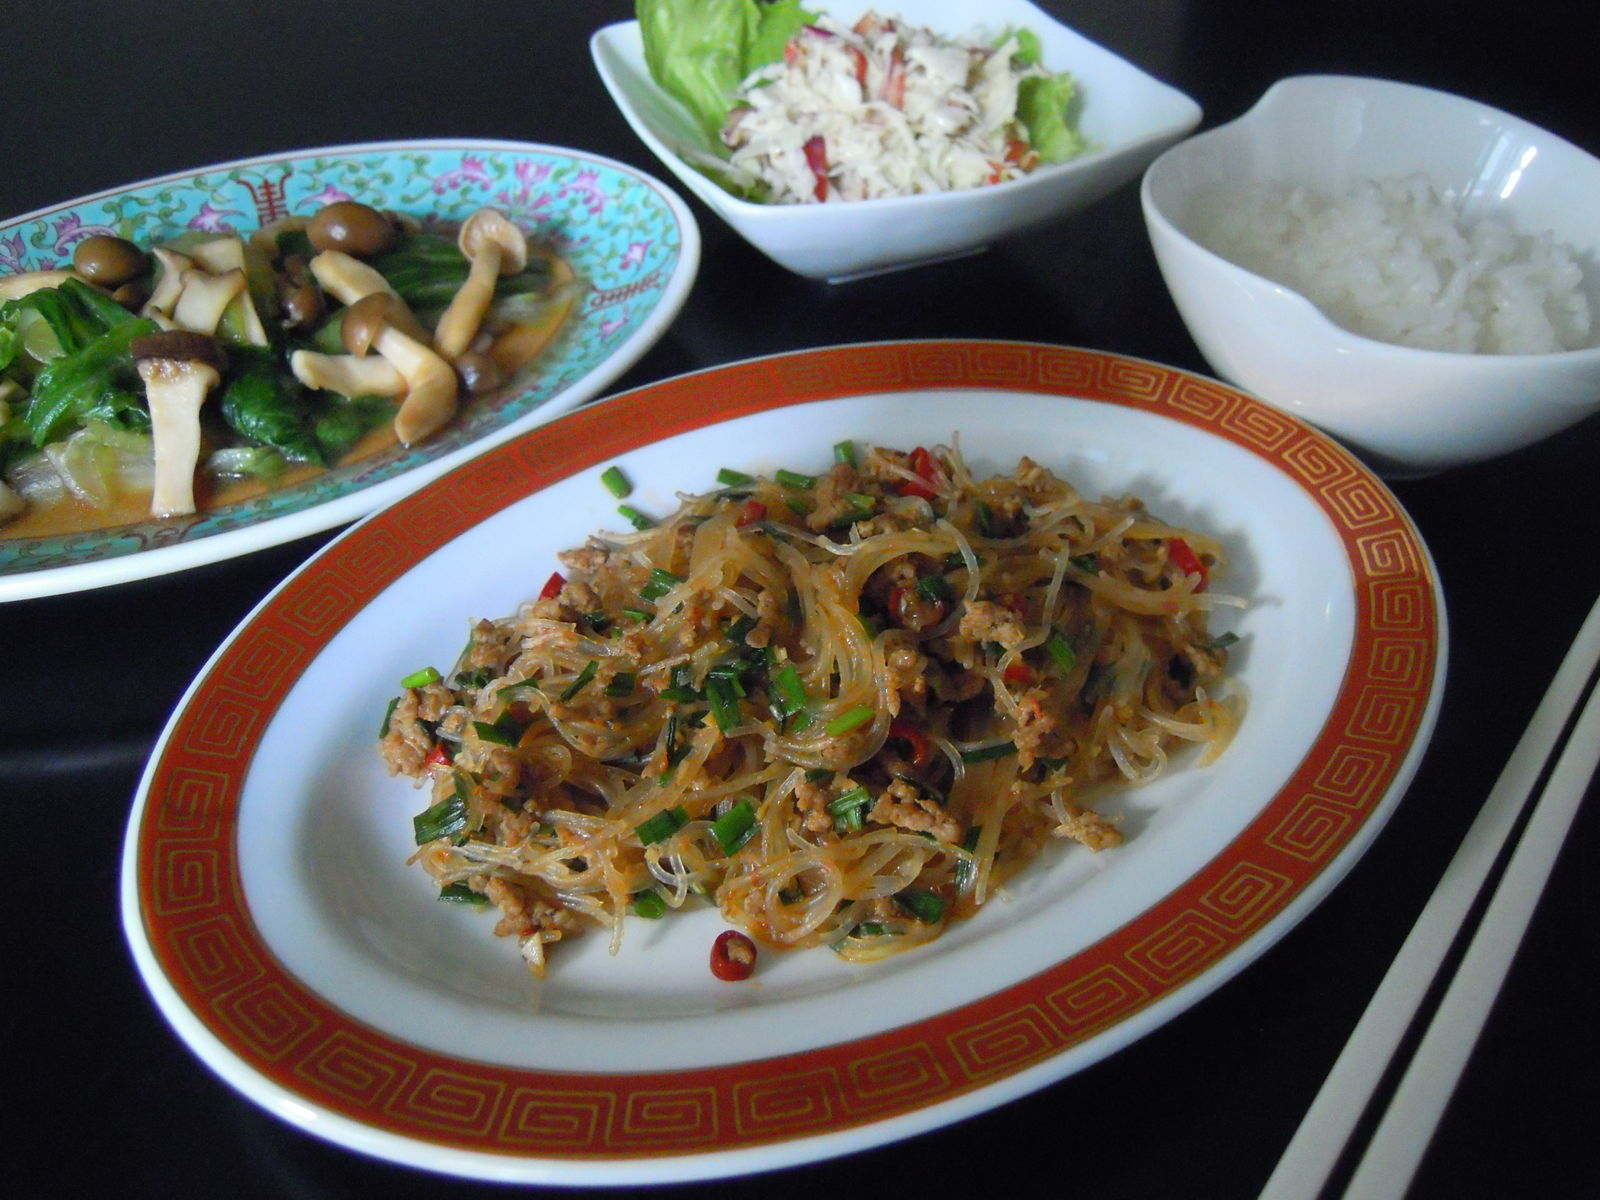 Mme.Sacicoの東京お昼ごはん : マーボー春雨&レタスとキノコの ...